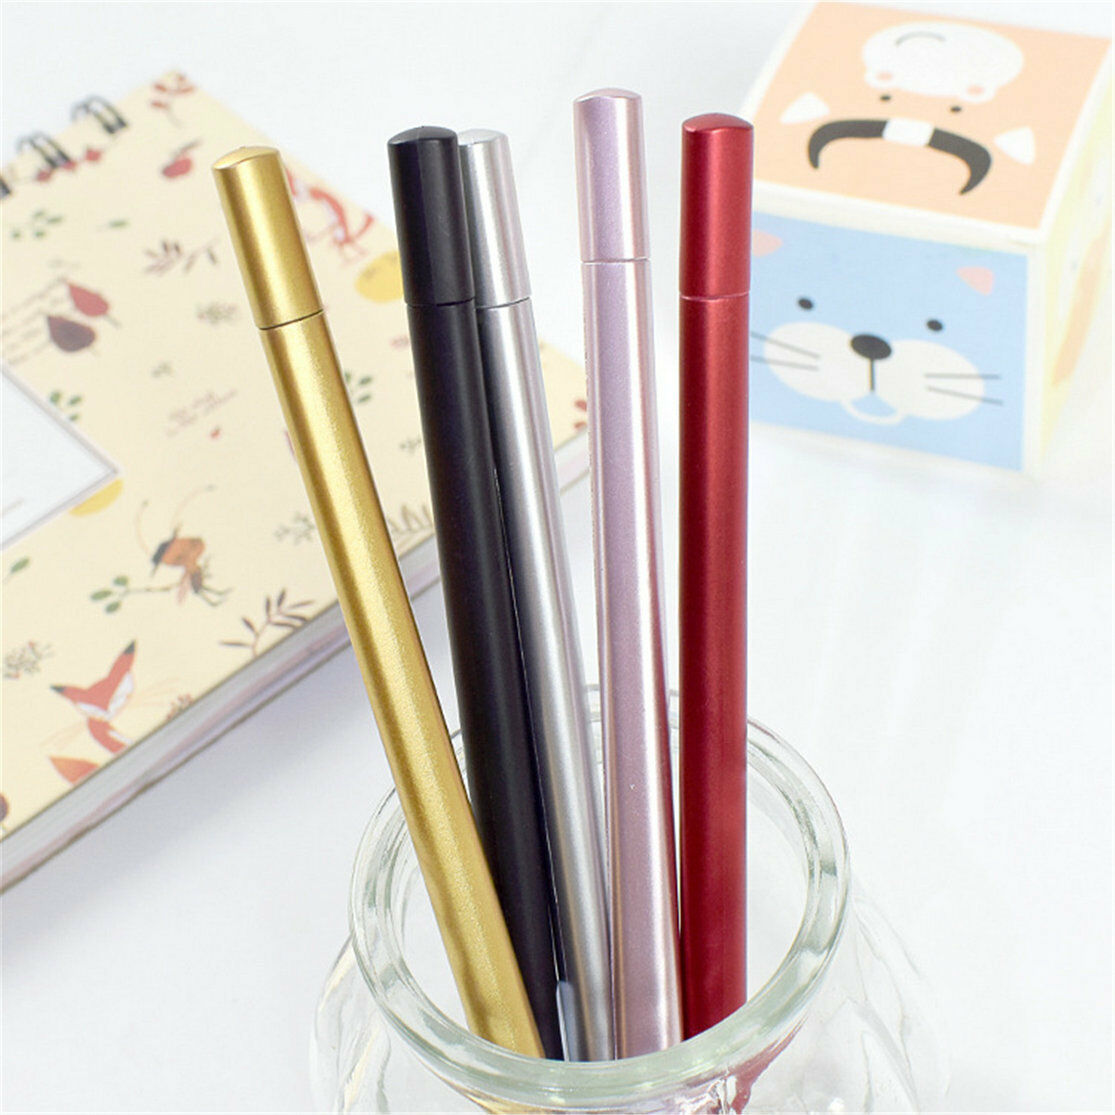 Details about 8pcs Office School Kids Business Metal sense Ballpoint Writing Gel Pens Gifts